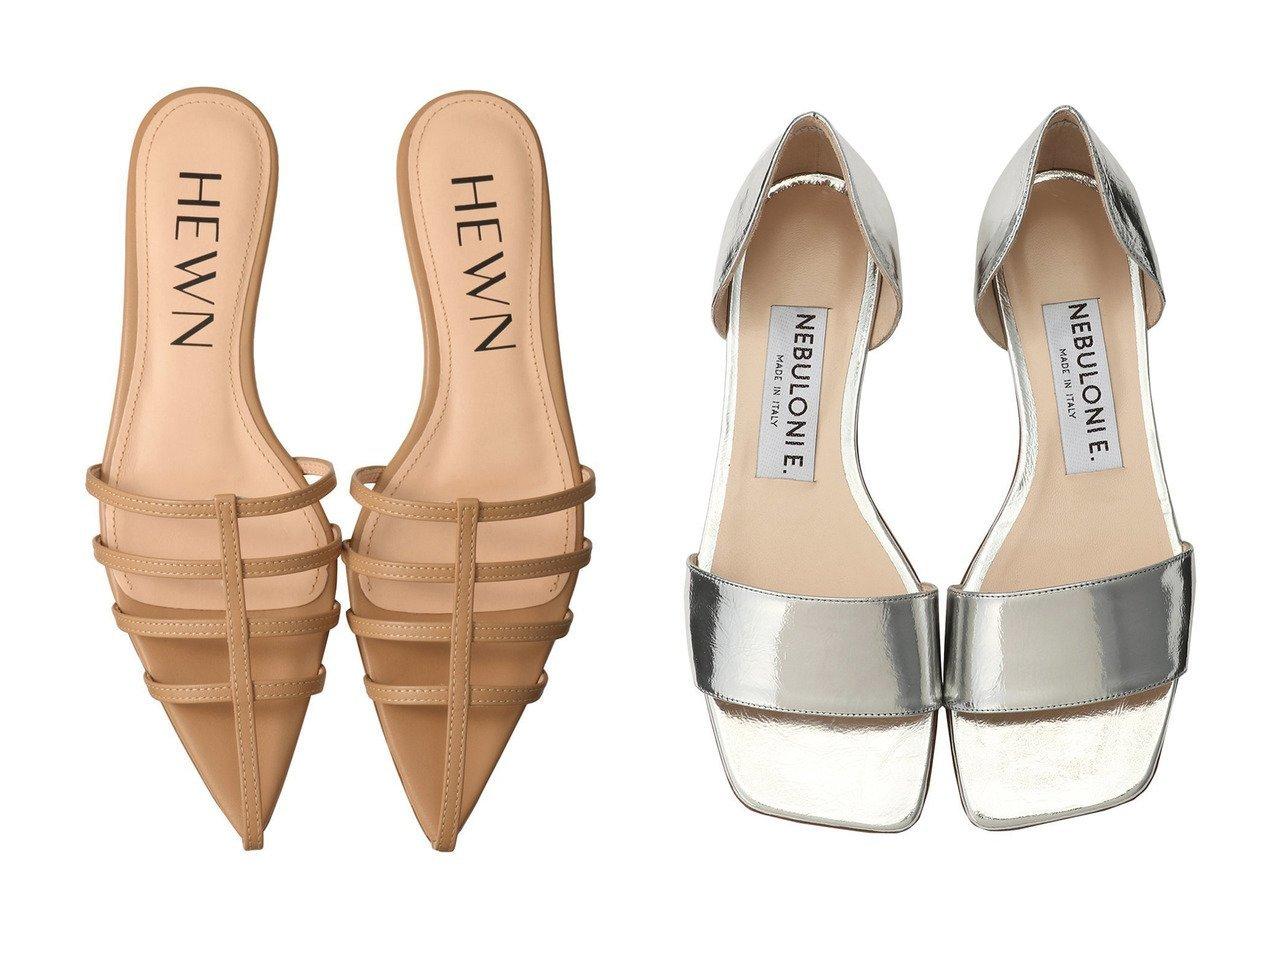 【1er Arrondissement/プルミエ アロンディスモン】の【NEBULONIE】フラットサンダル&【HEWN/ヒューン】のポインテッドトゥストラップミュール シューズ・靴のおすすめ!人気、トレンド・レディースファッションの通販 おすすめで人気の流行・トレンド、ファッションの通販商品 メンズファッション・キッズファッション・インテリア・家具・レディースファッション・服の通販 founy(ファニー) https://founy.com/ ファッション Fashion レディースファッション WOMEN 2021年 2021 2021 春夏 S/S SS Spring/Summer 2021 S/S 春夏 SS Spring/Summer オケージョン サンダル フラット ミュール 春 Spring |ID:crp329100000025022